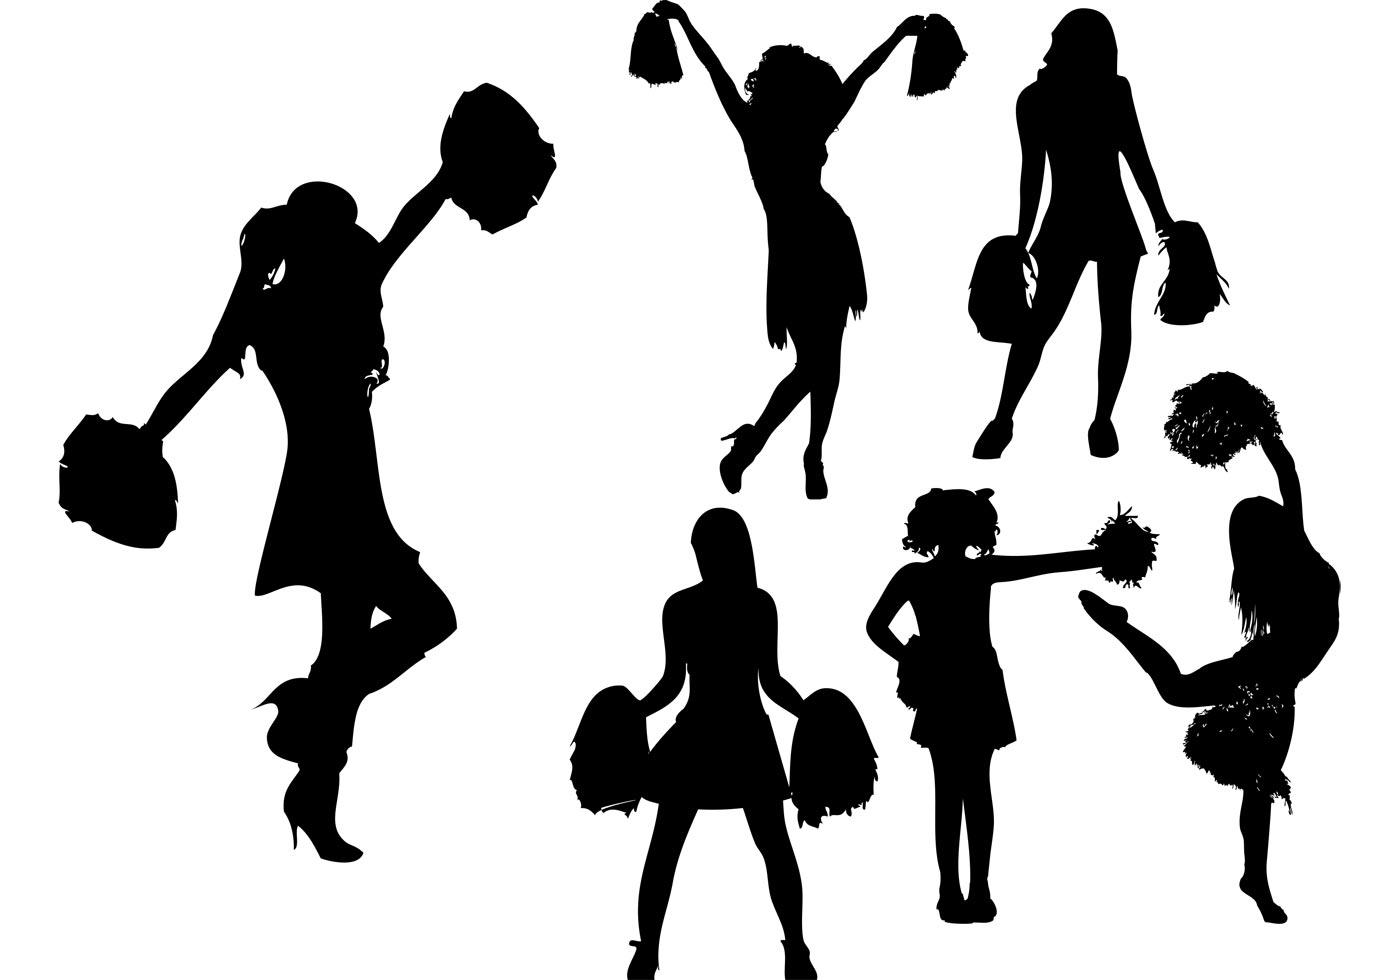 Cheerleader Silhouette Vectors